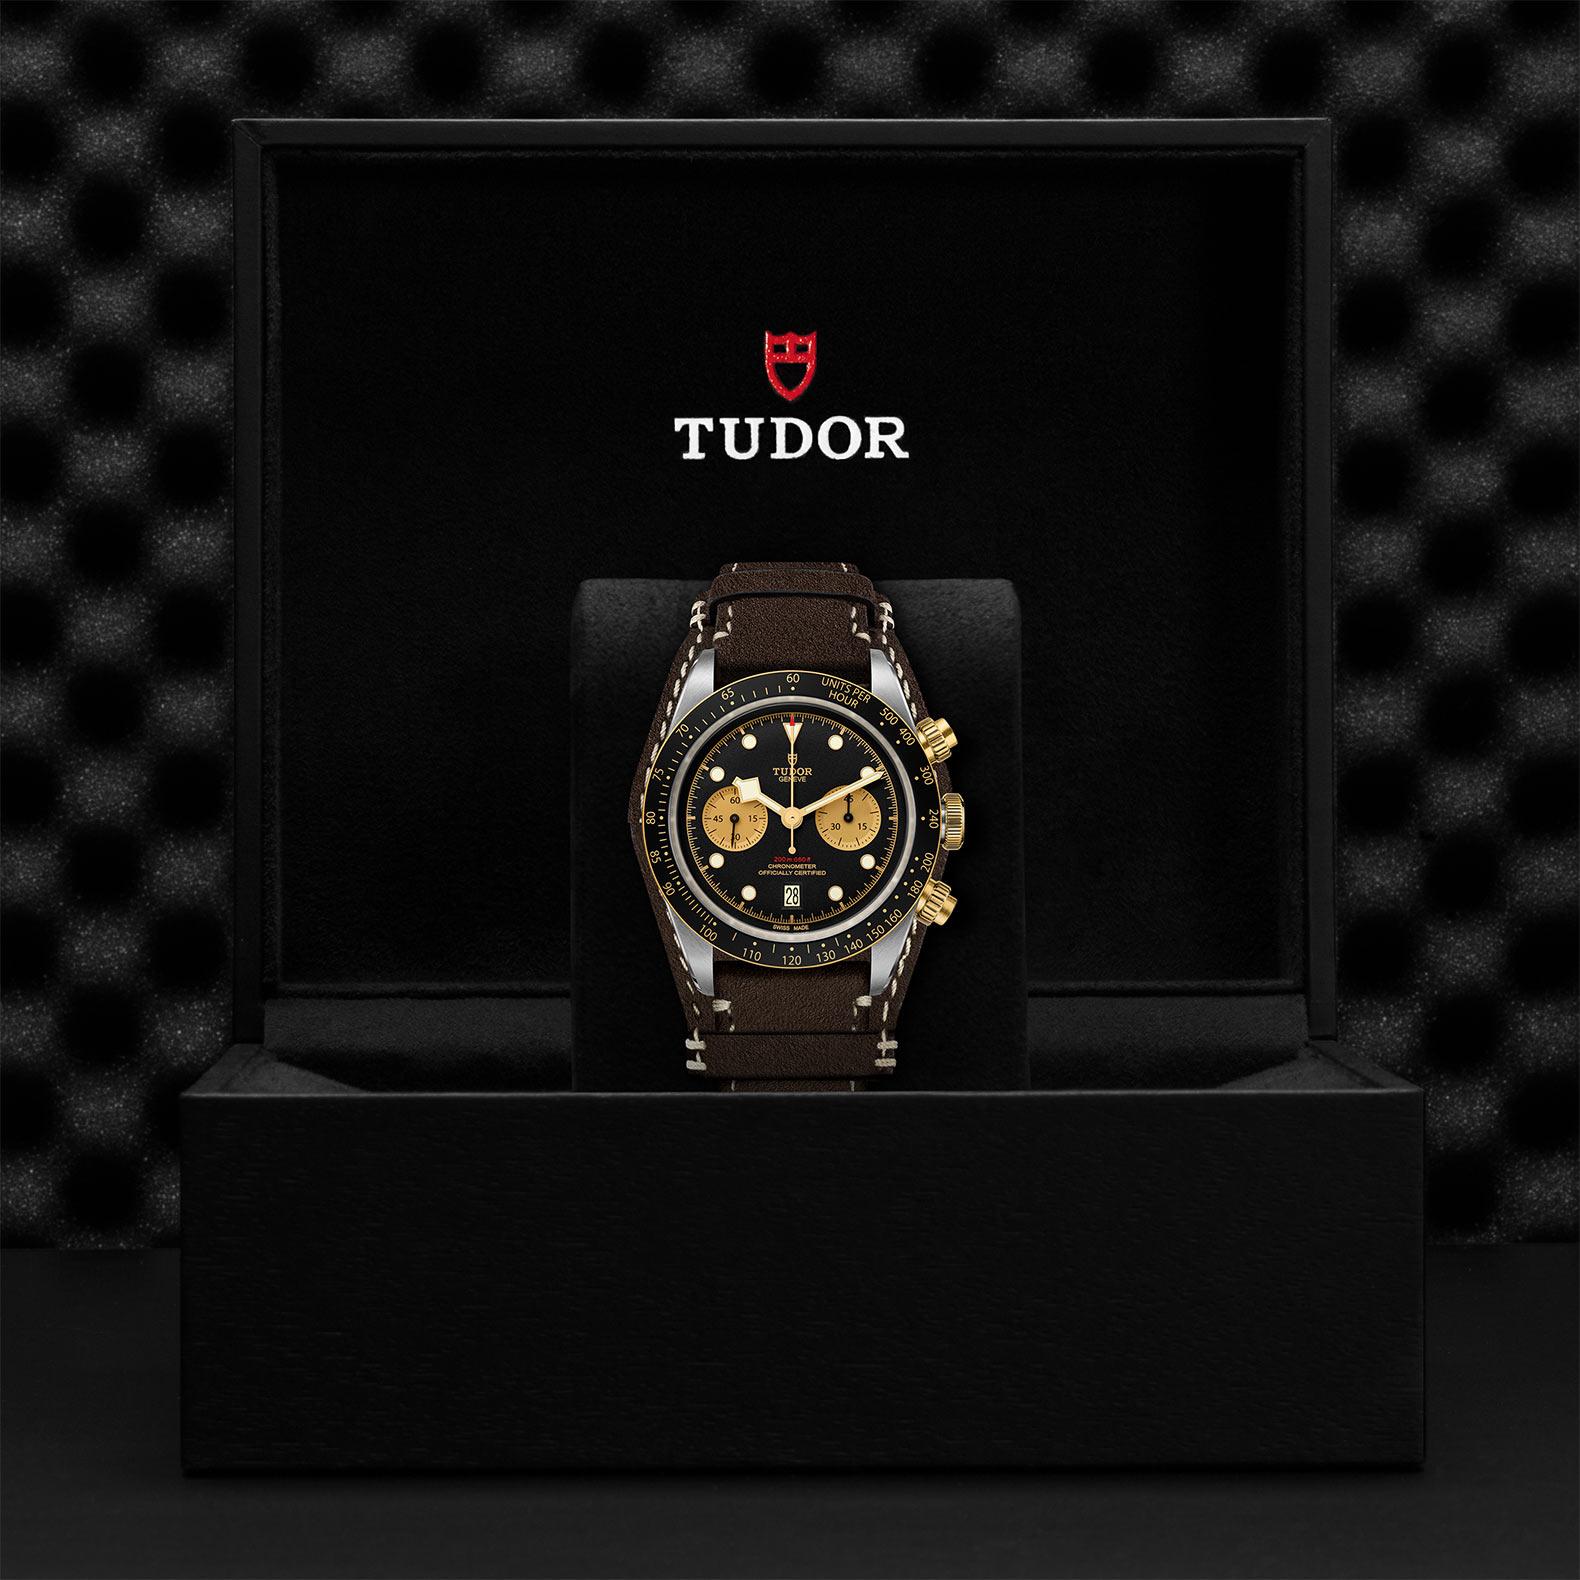 TUDOR Black Bay Chrono SG M79363N 0002 Presentation